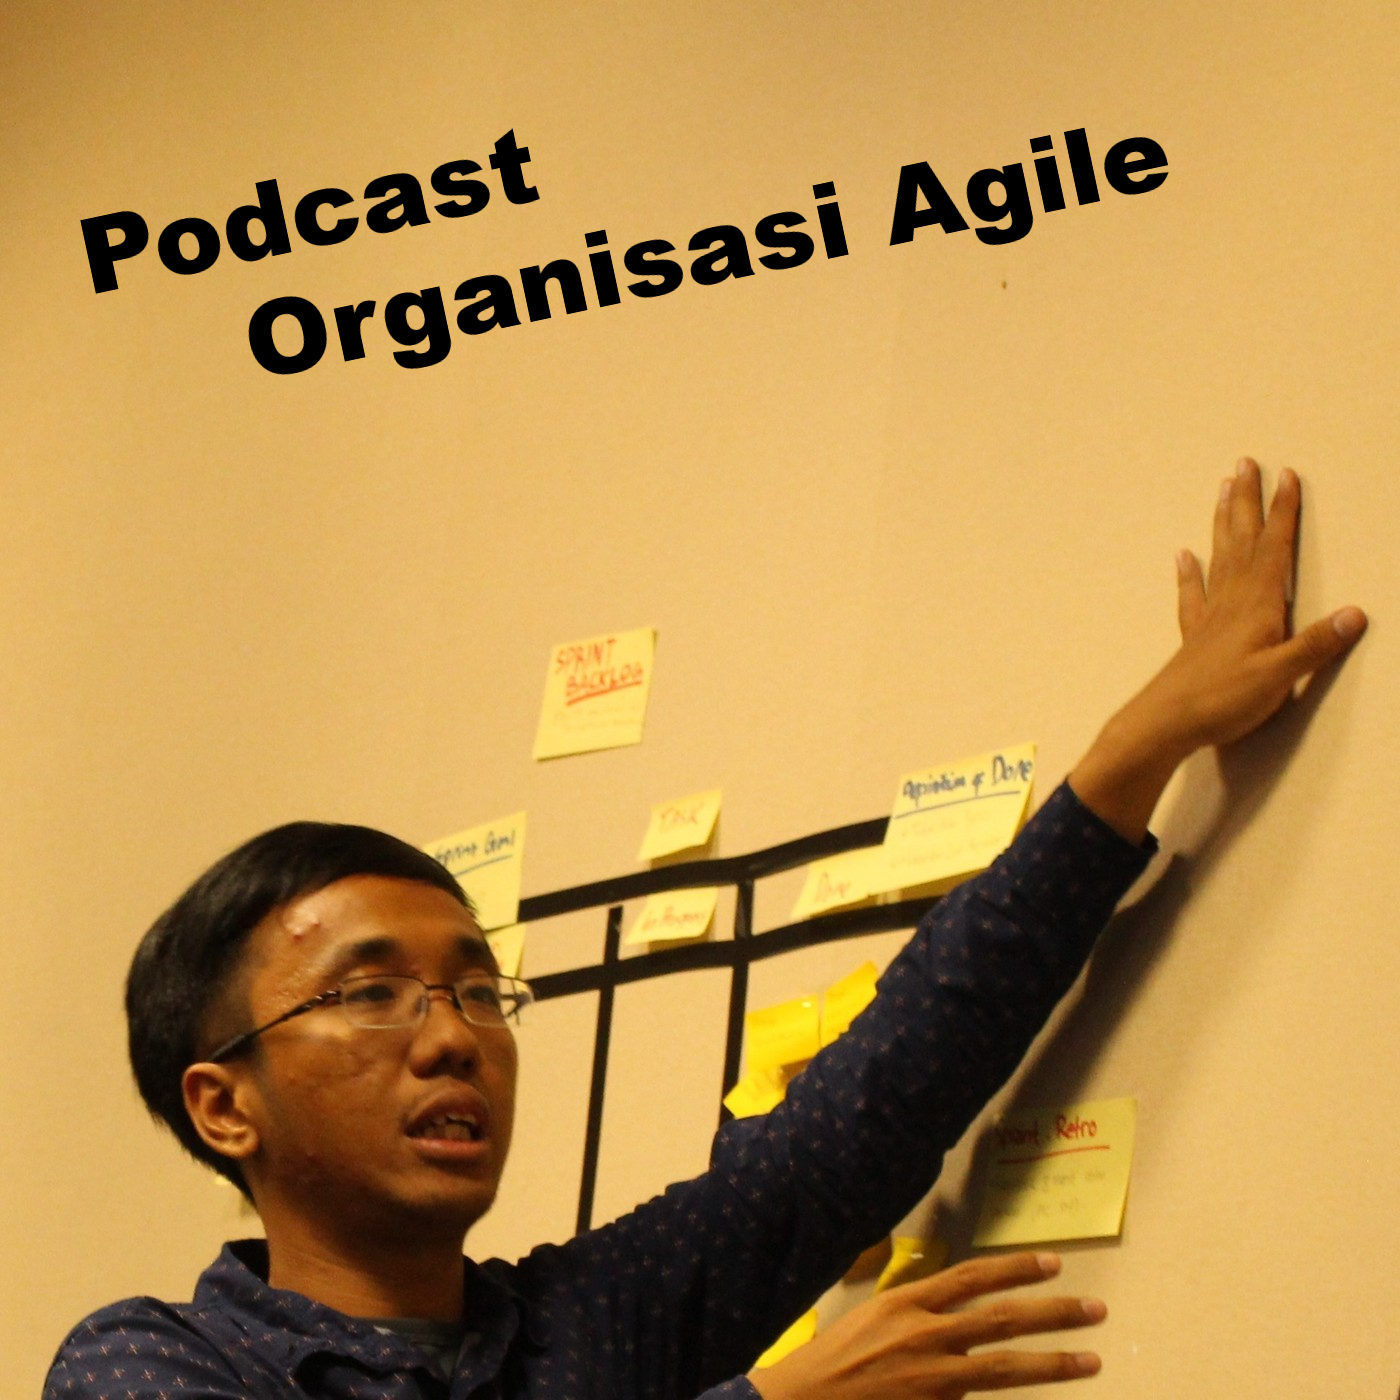 Podcast Organisasi Agile